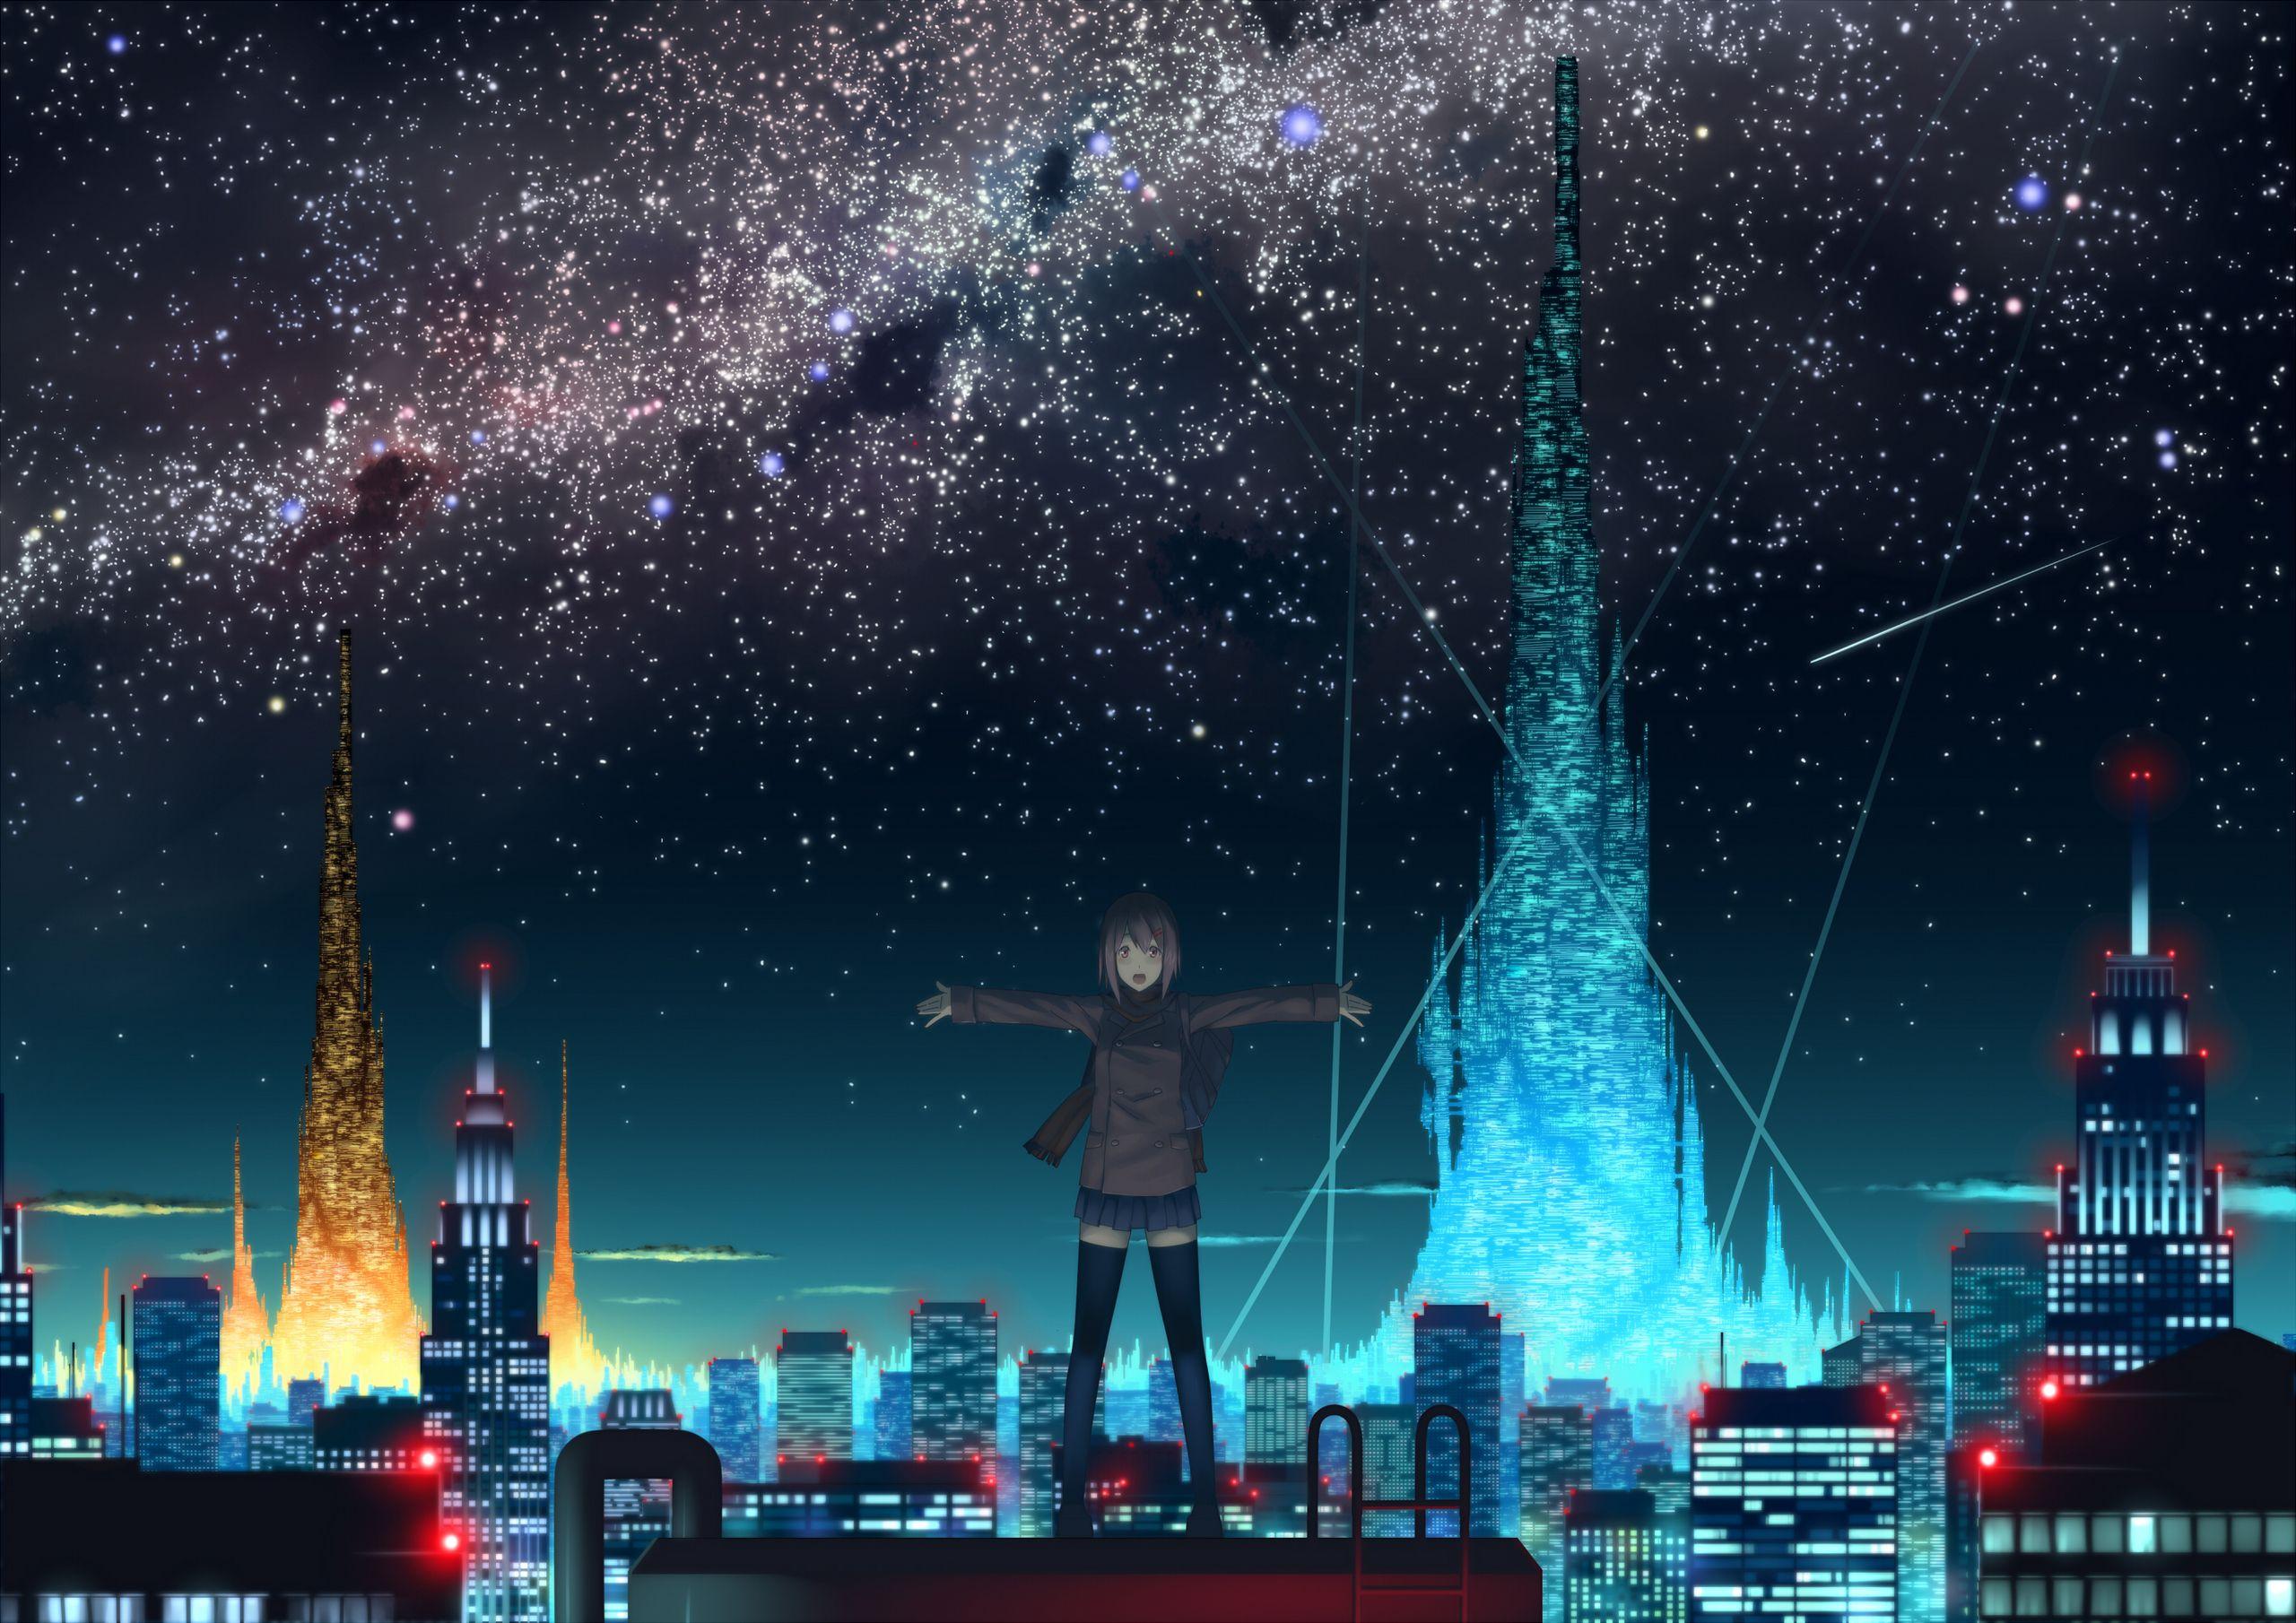 Anime Photo Anime Scenery Anime Scenery Wallpaper Anime City Anime Scenery